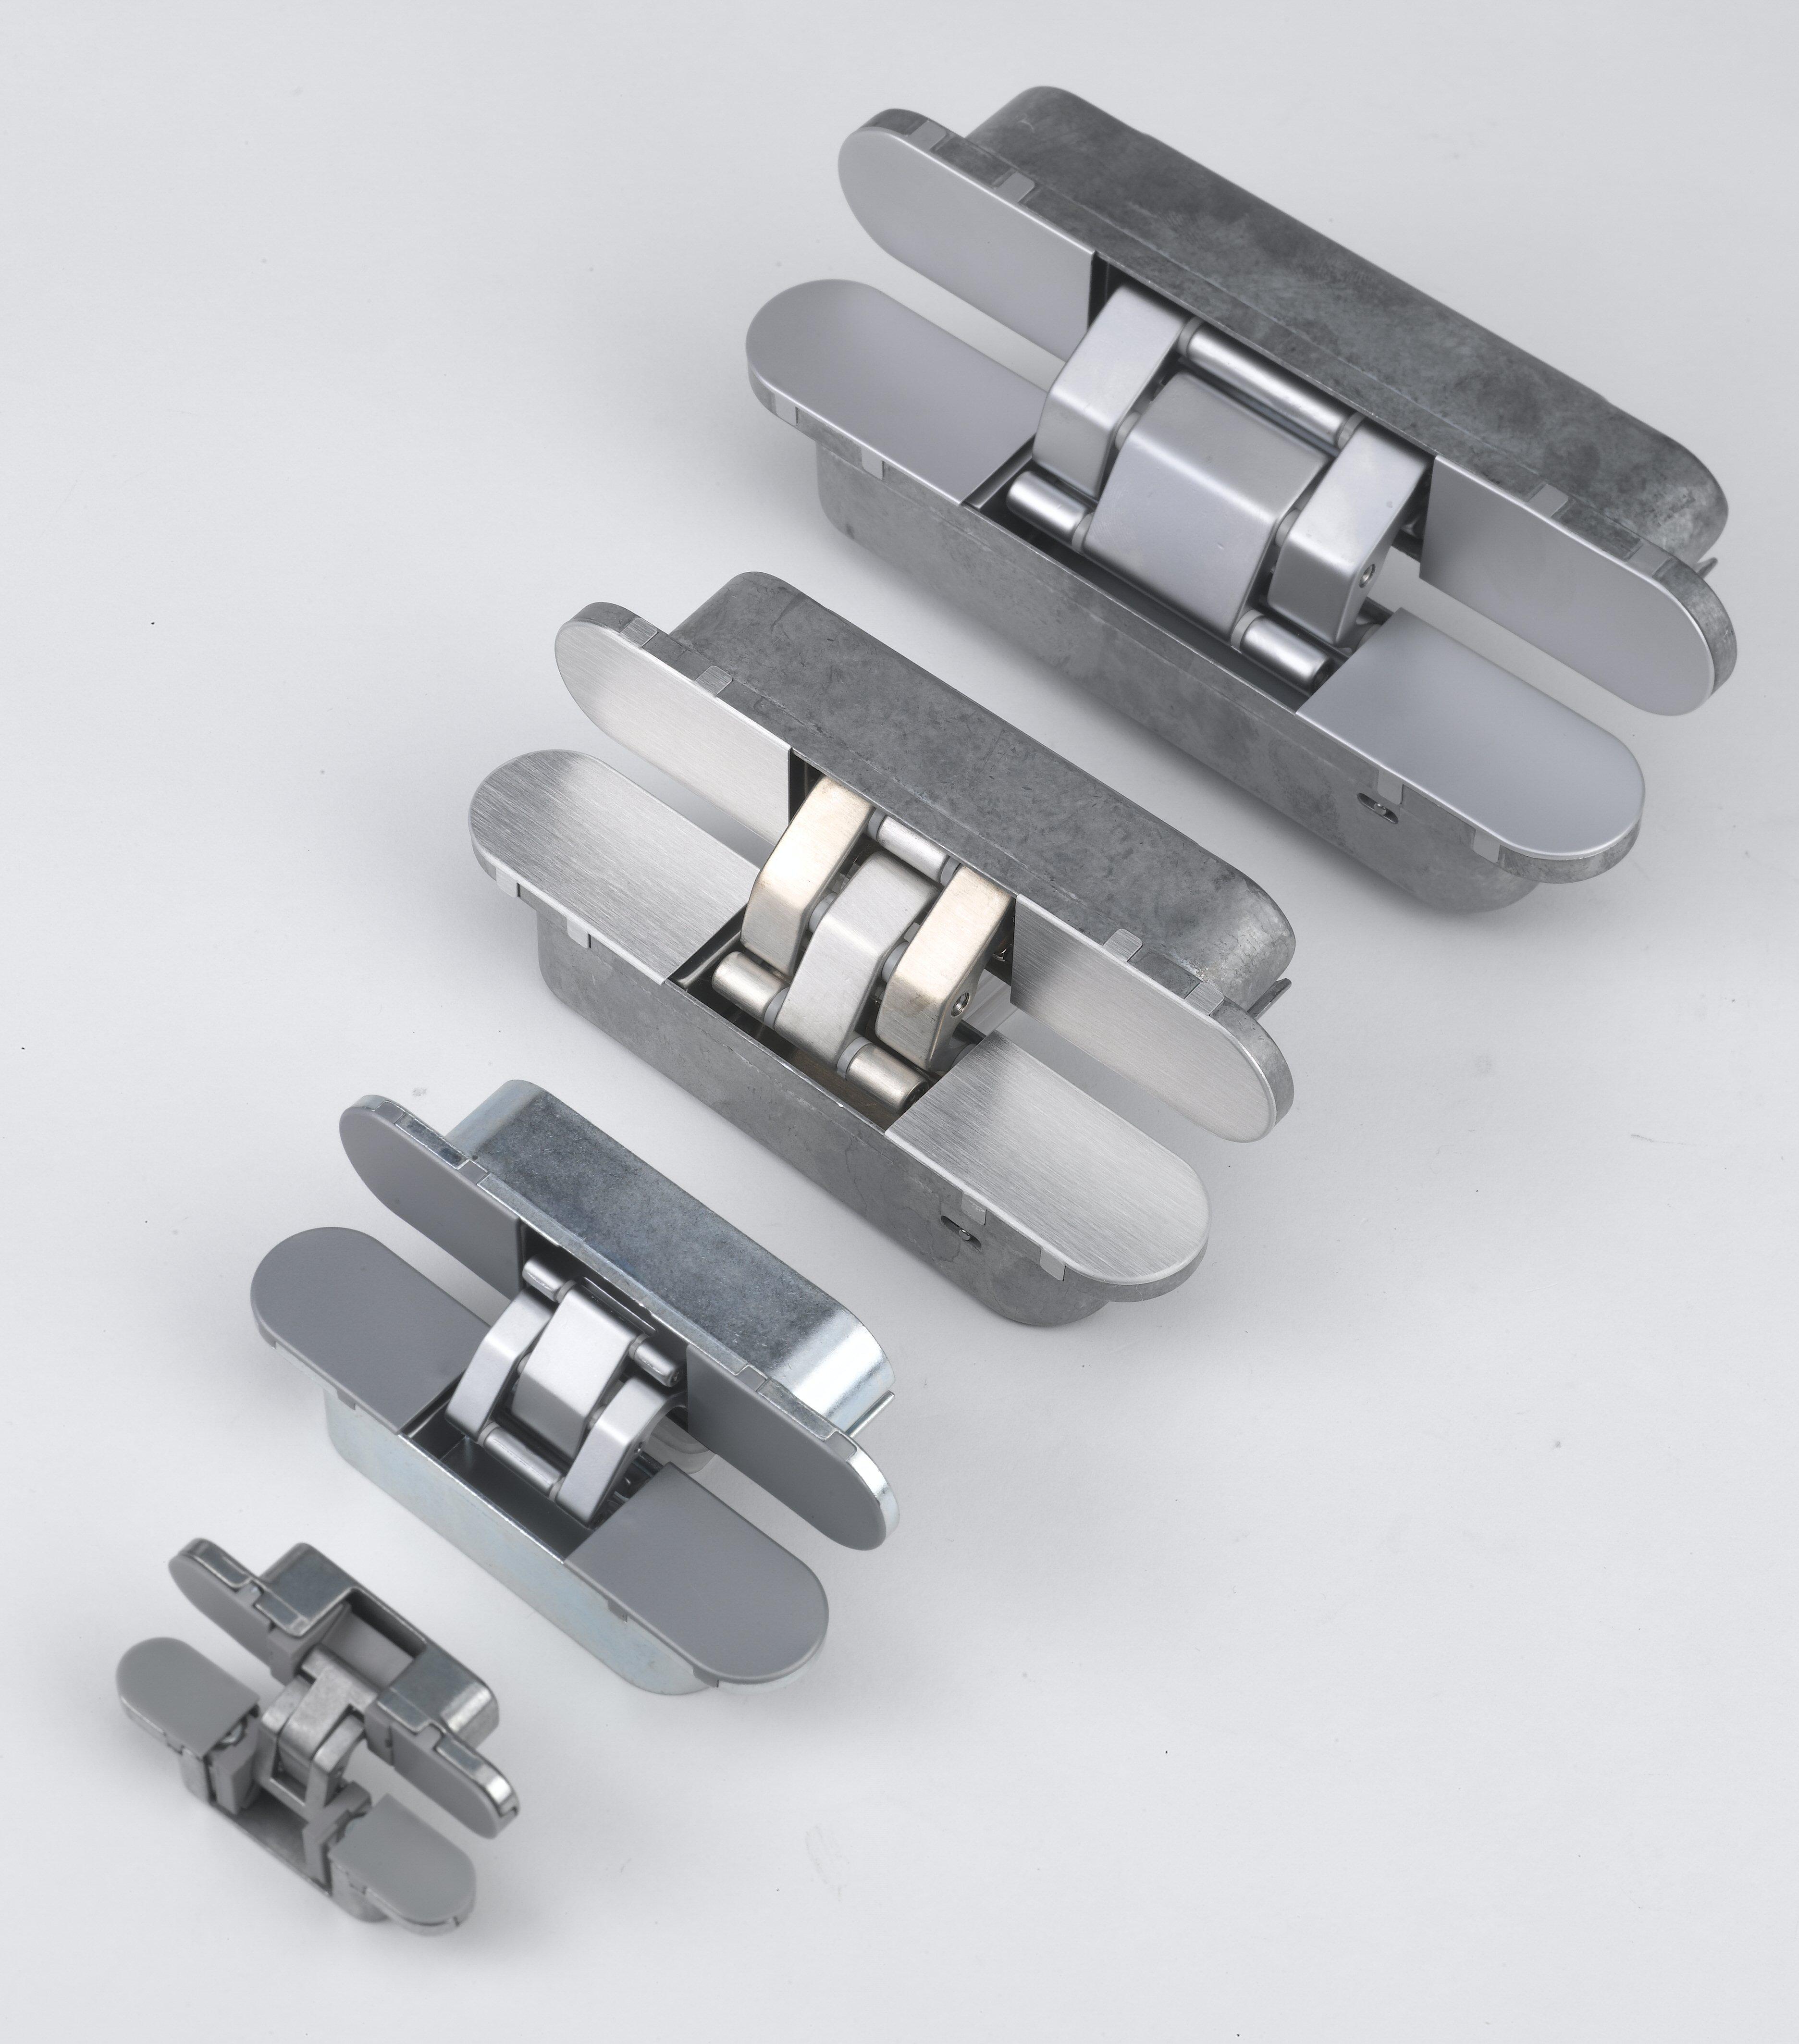 K Series Hinges Royde & Tucker Manufacturing